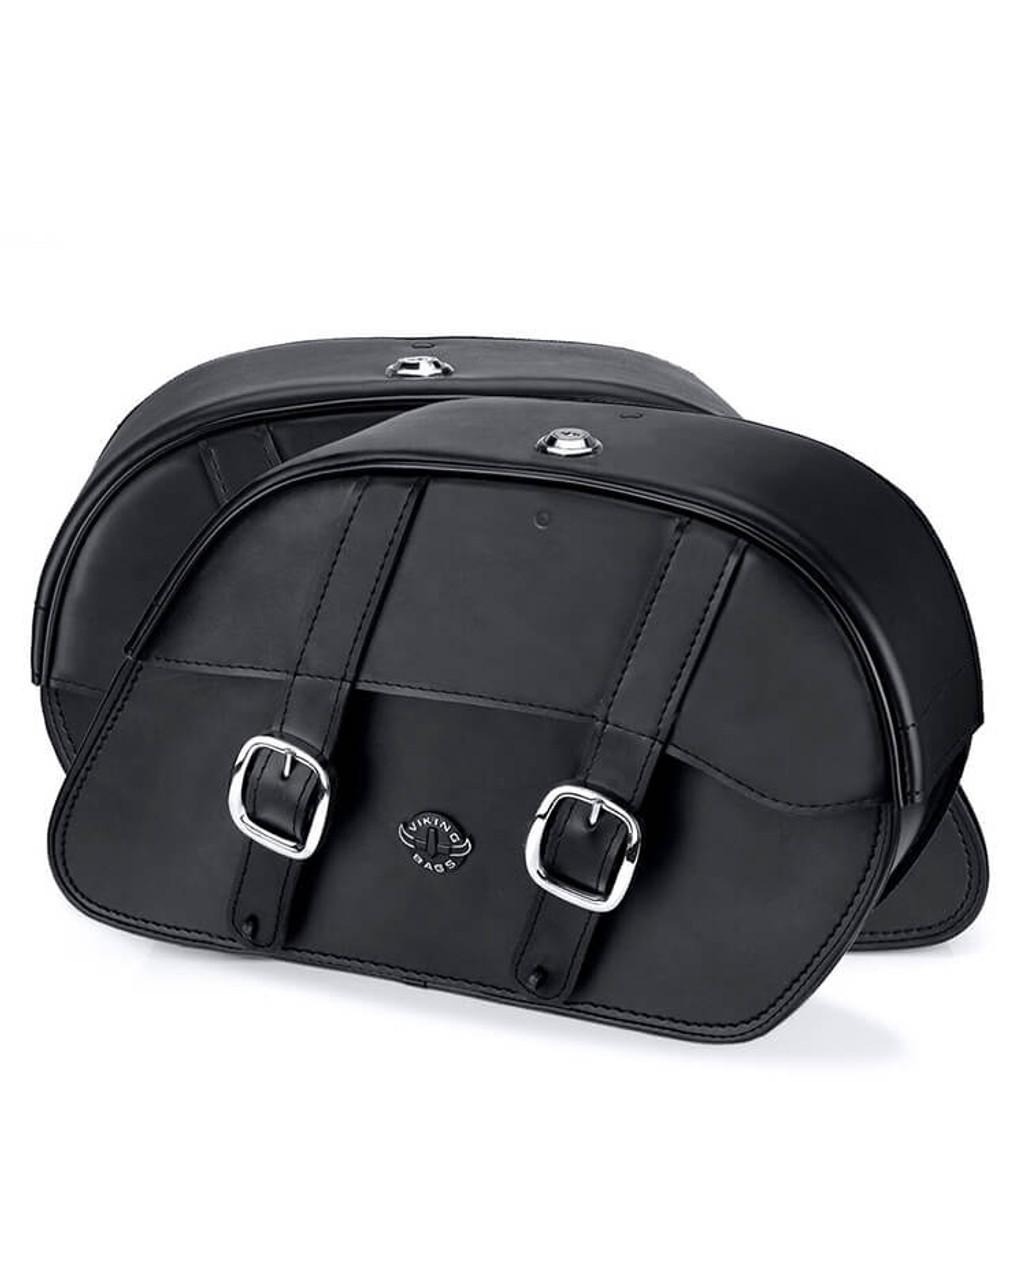 VikingBags Skarner Large Double Strap Kawasaki Vulcan S ABS Cafe Leather Motorcycle Saddlebags Both Bags View